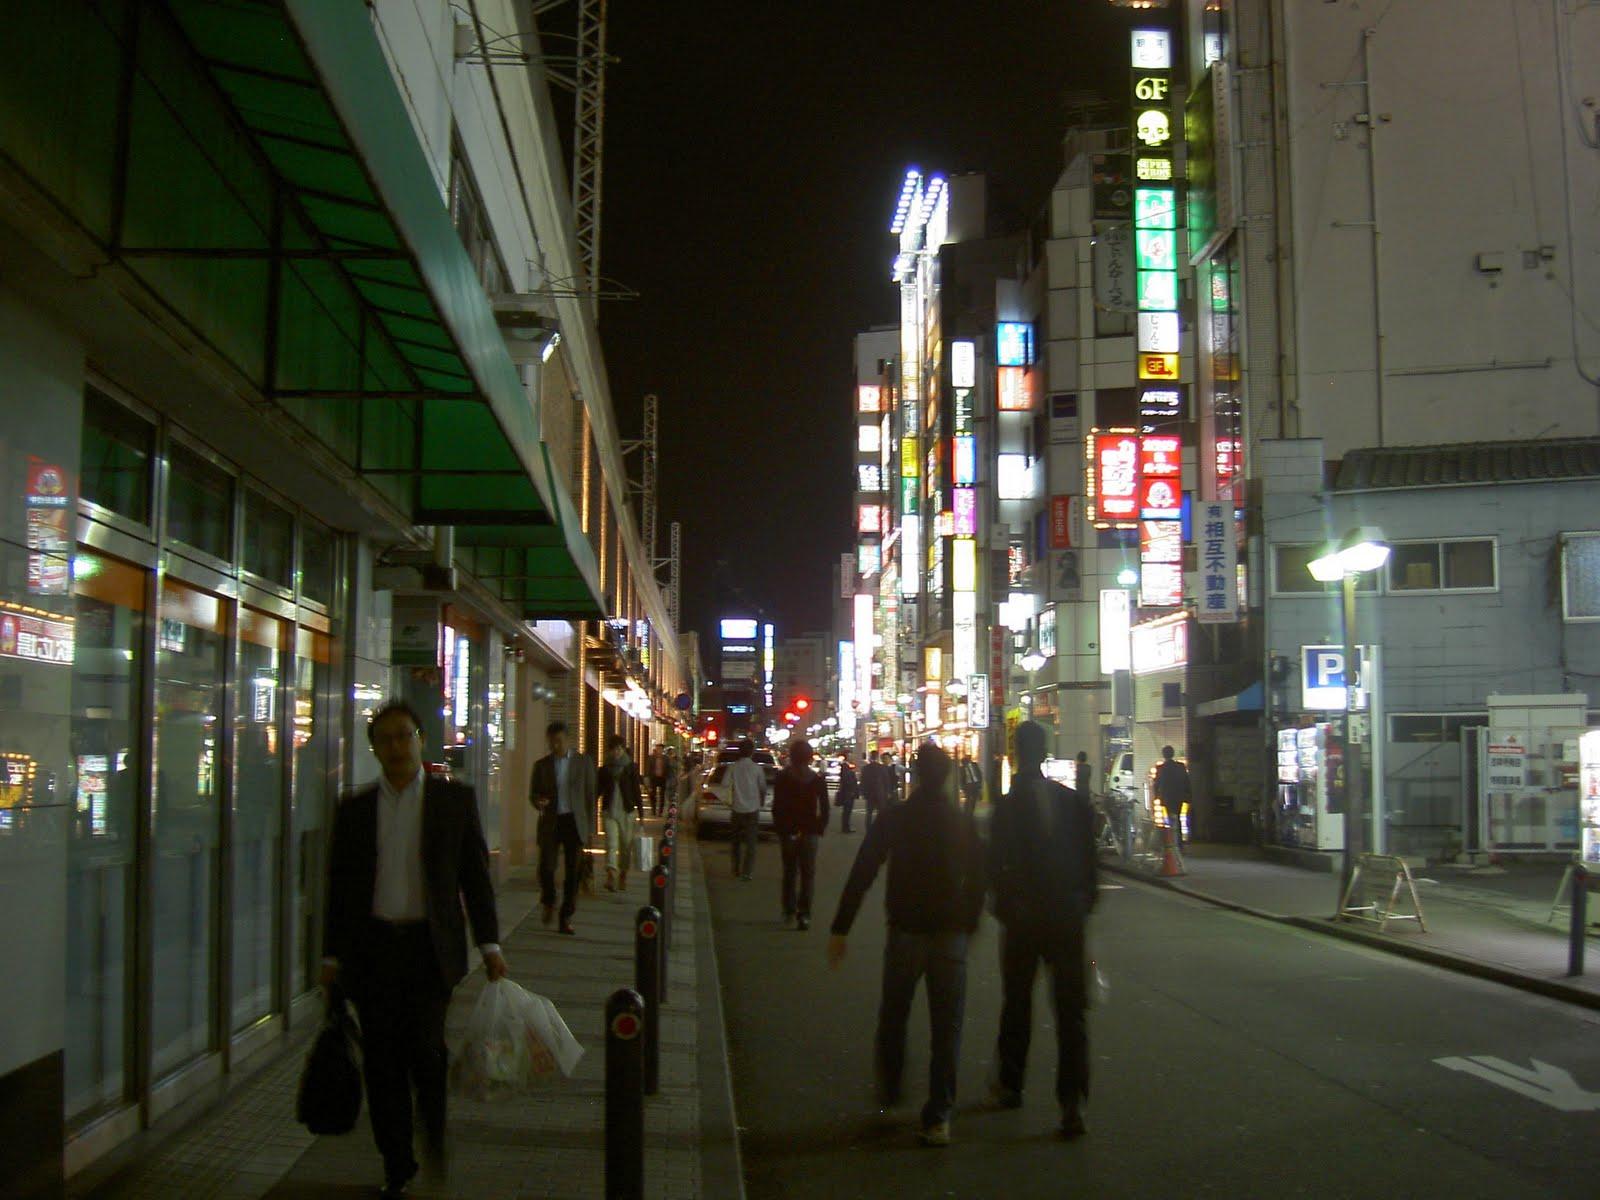 ADAWAK: Kichijoji Evening Walk